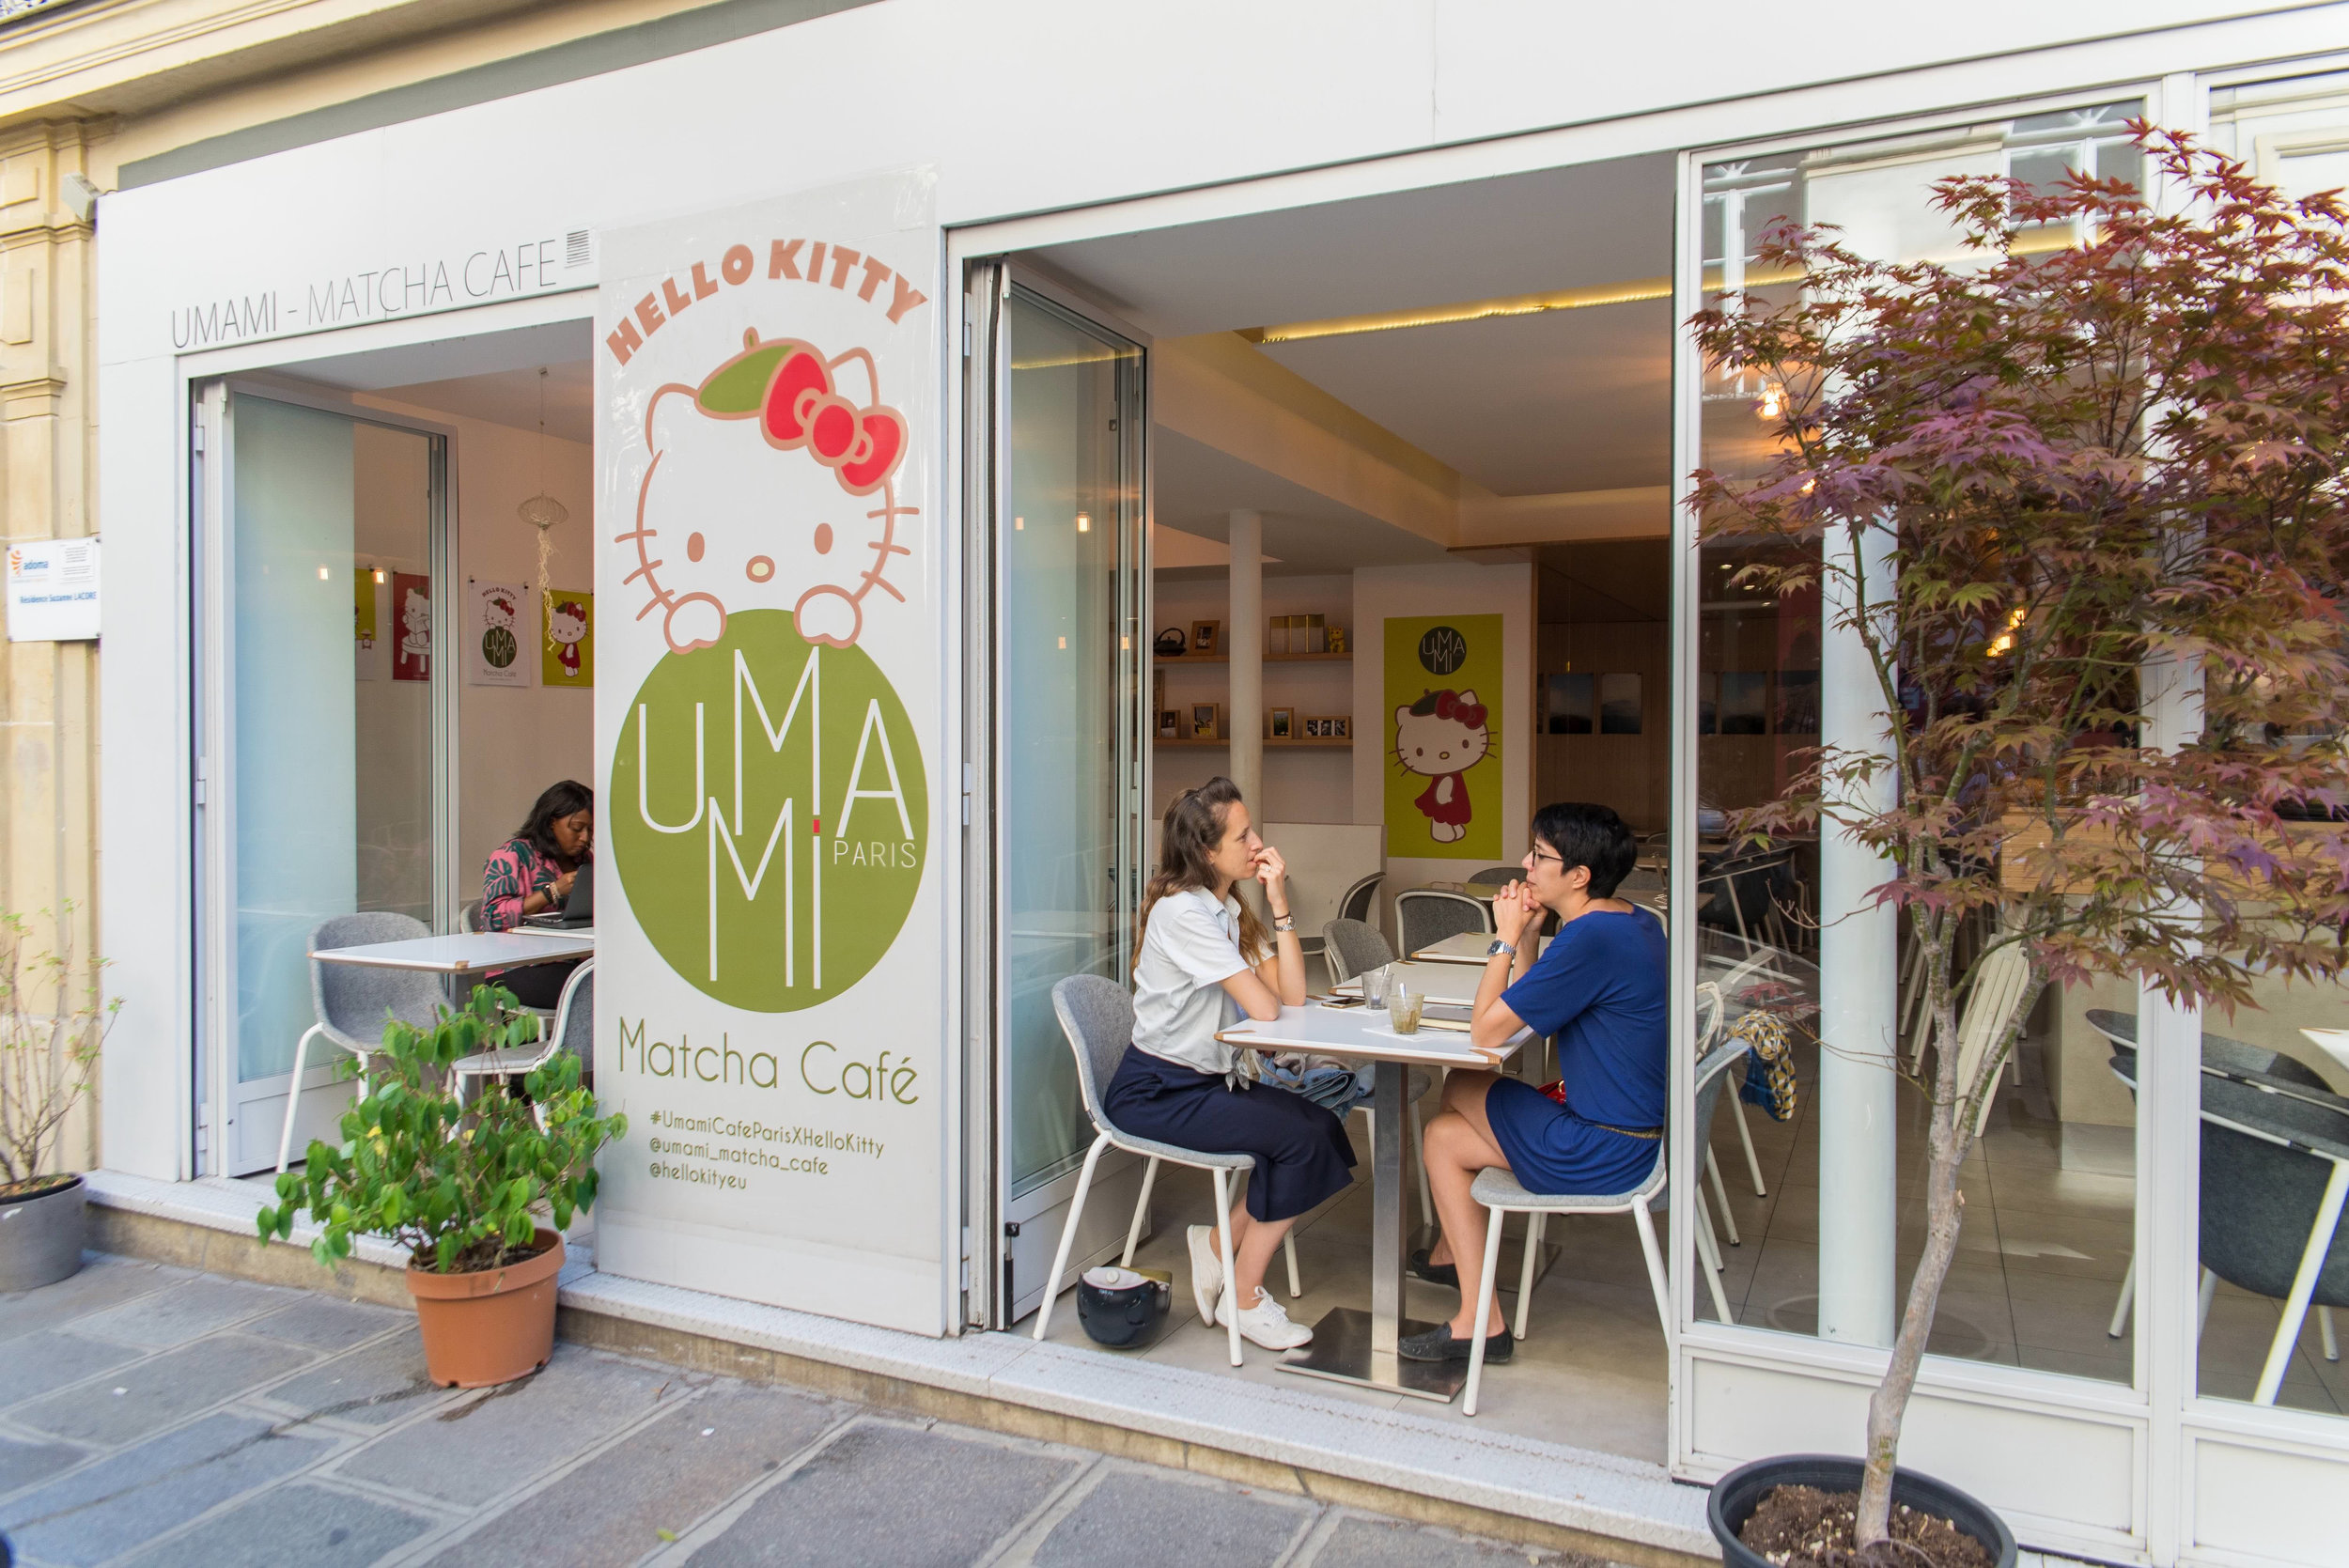 Umami-matcha-cafe-hello-kitty-elisa-les-bons-tuyaux-1.jpg